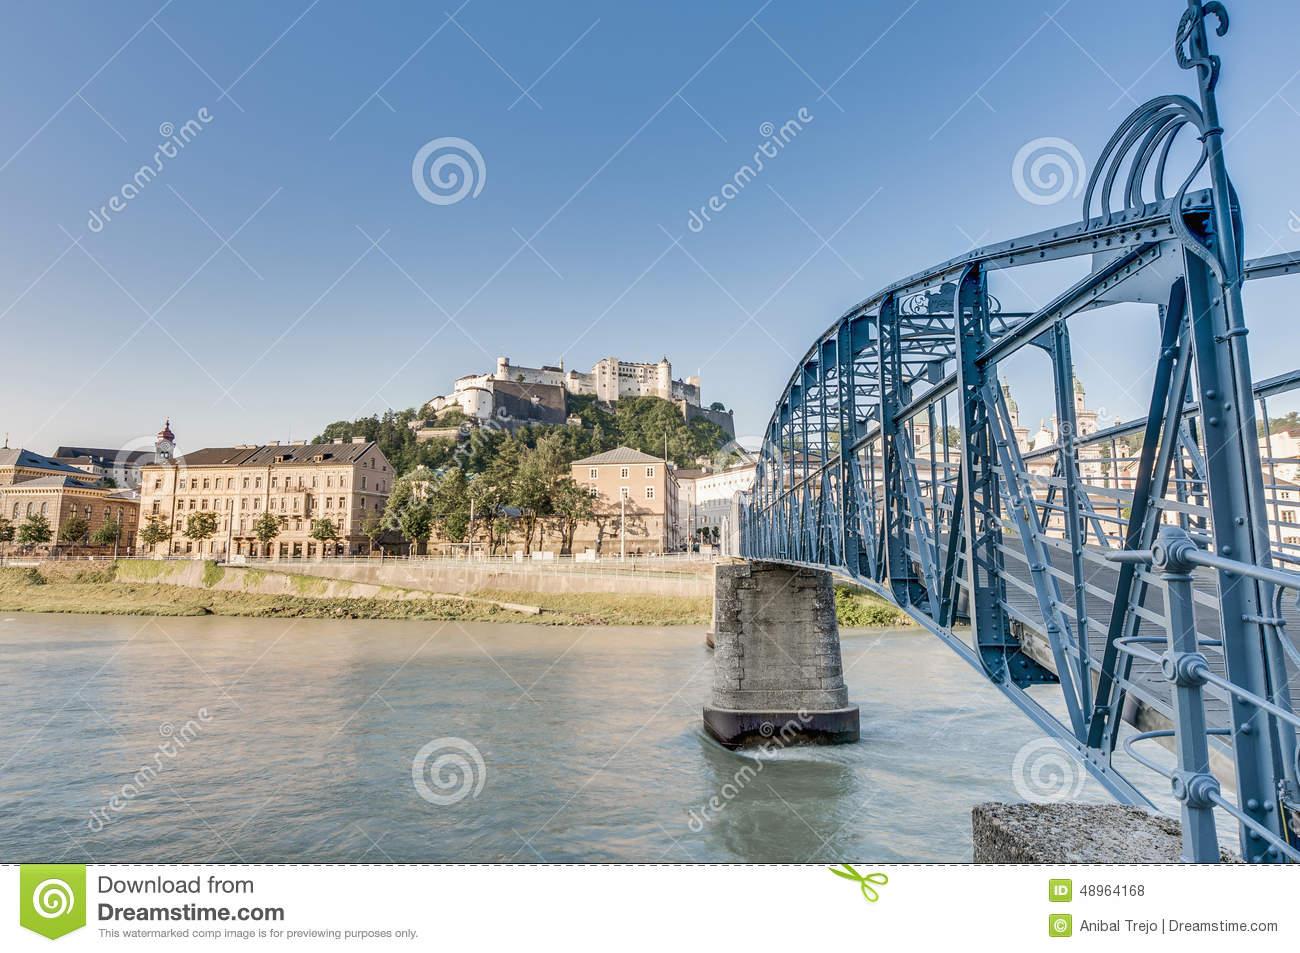 Mozart Bridge (Mozartsteg) And Salzach River At Salzburg, Austri.